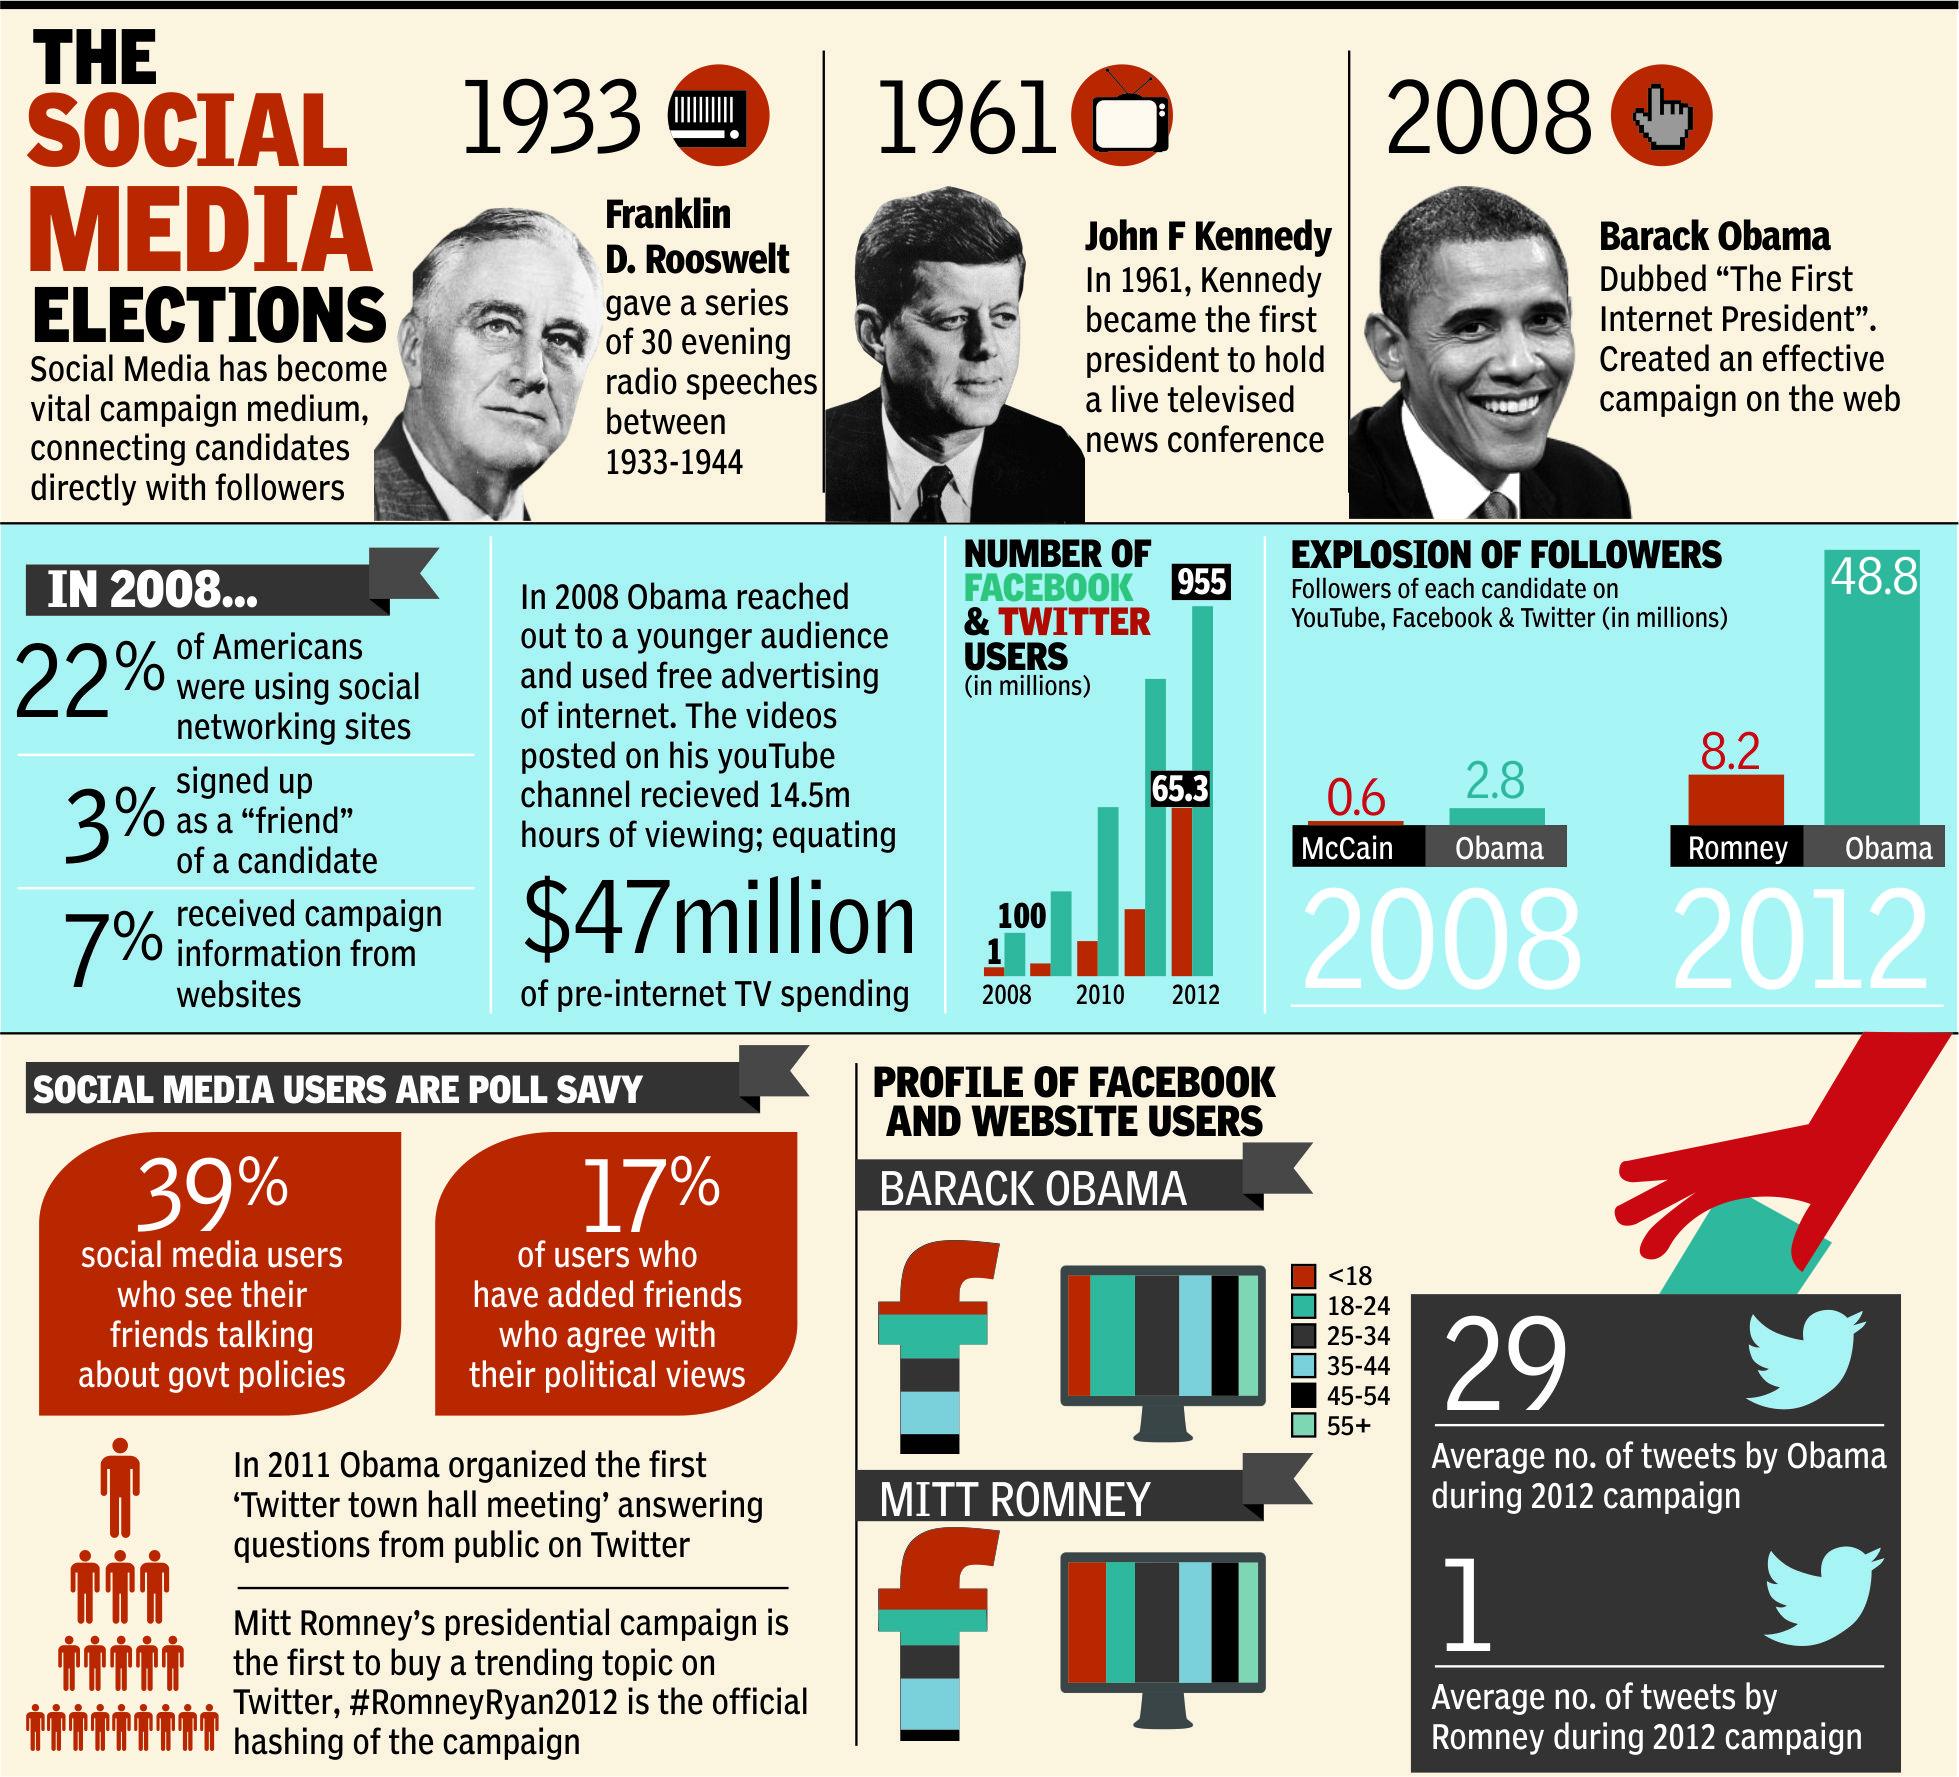 the-social-media-elections_51851b86bb6e8